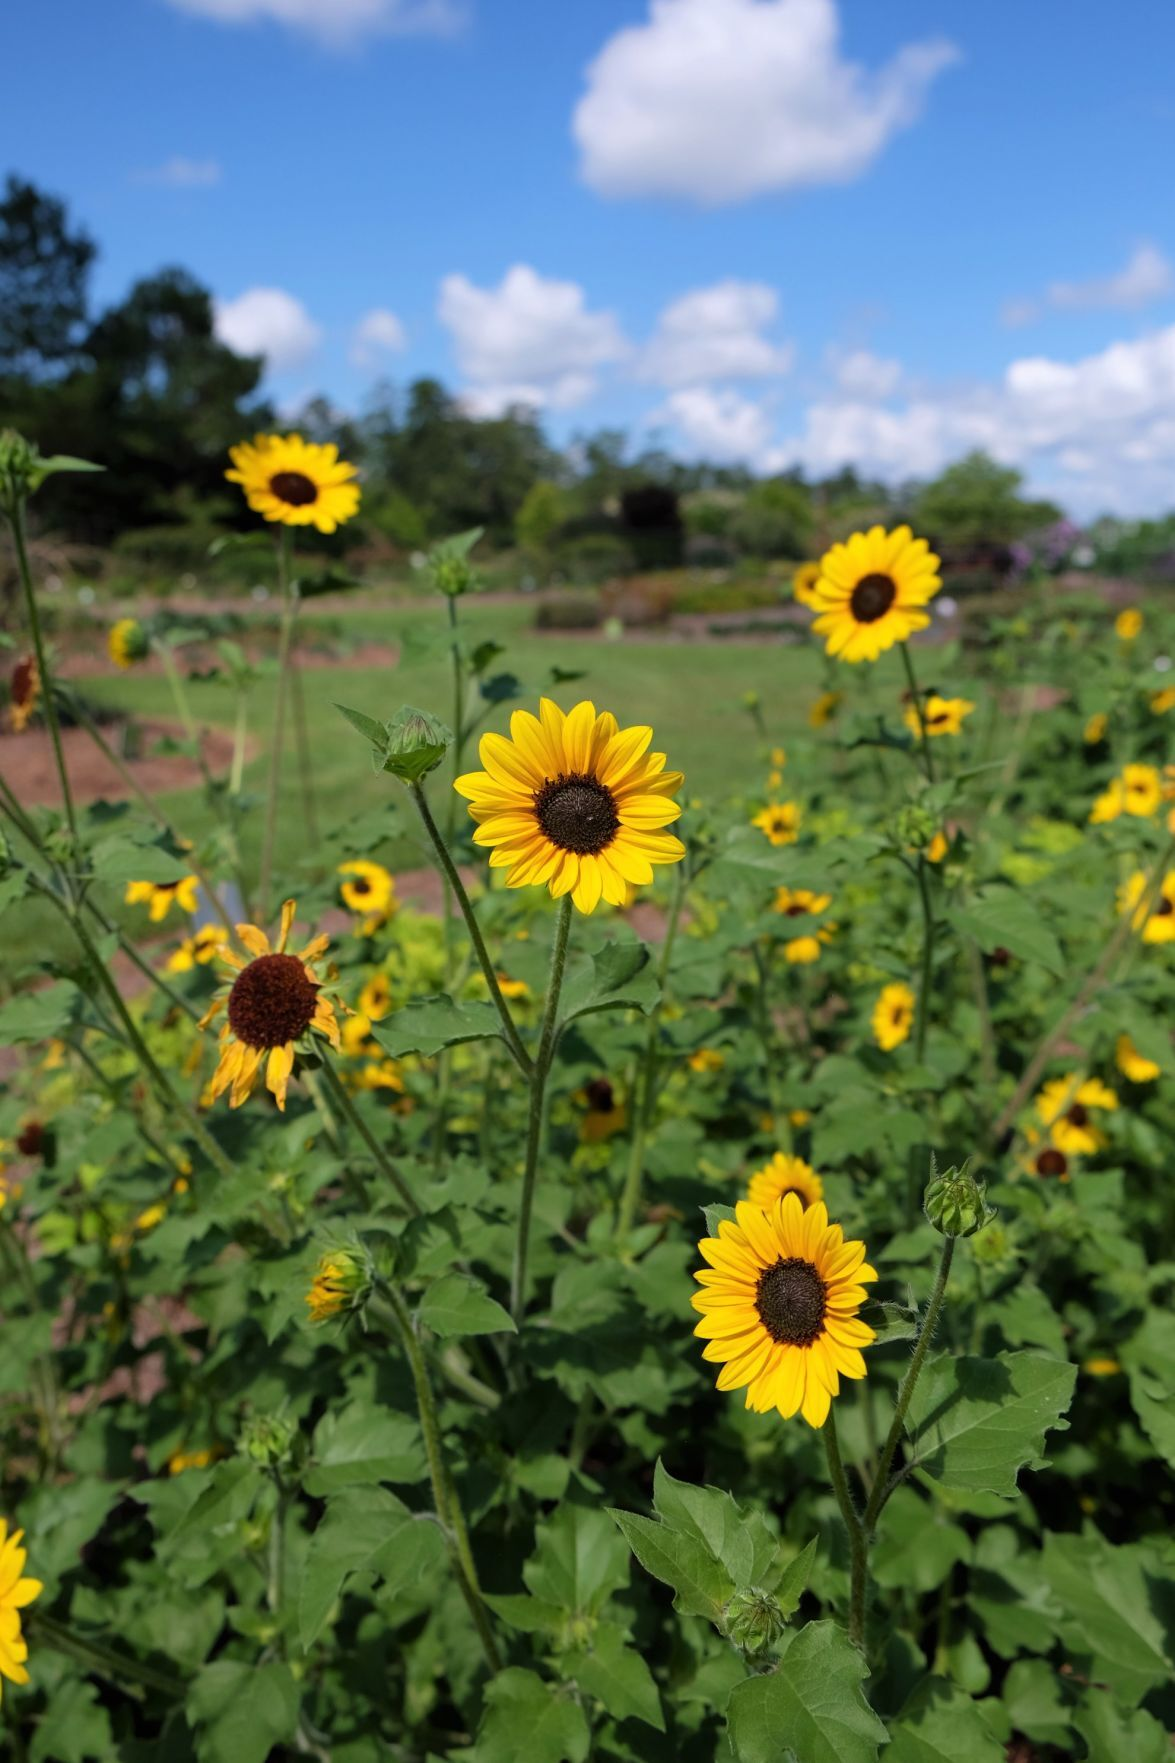 Beacon Impatiens, Suncredible Yellow sunflower make Super Plants list